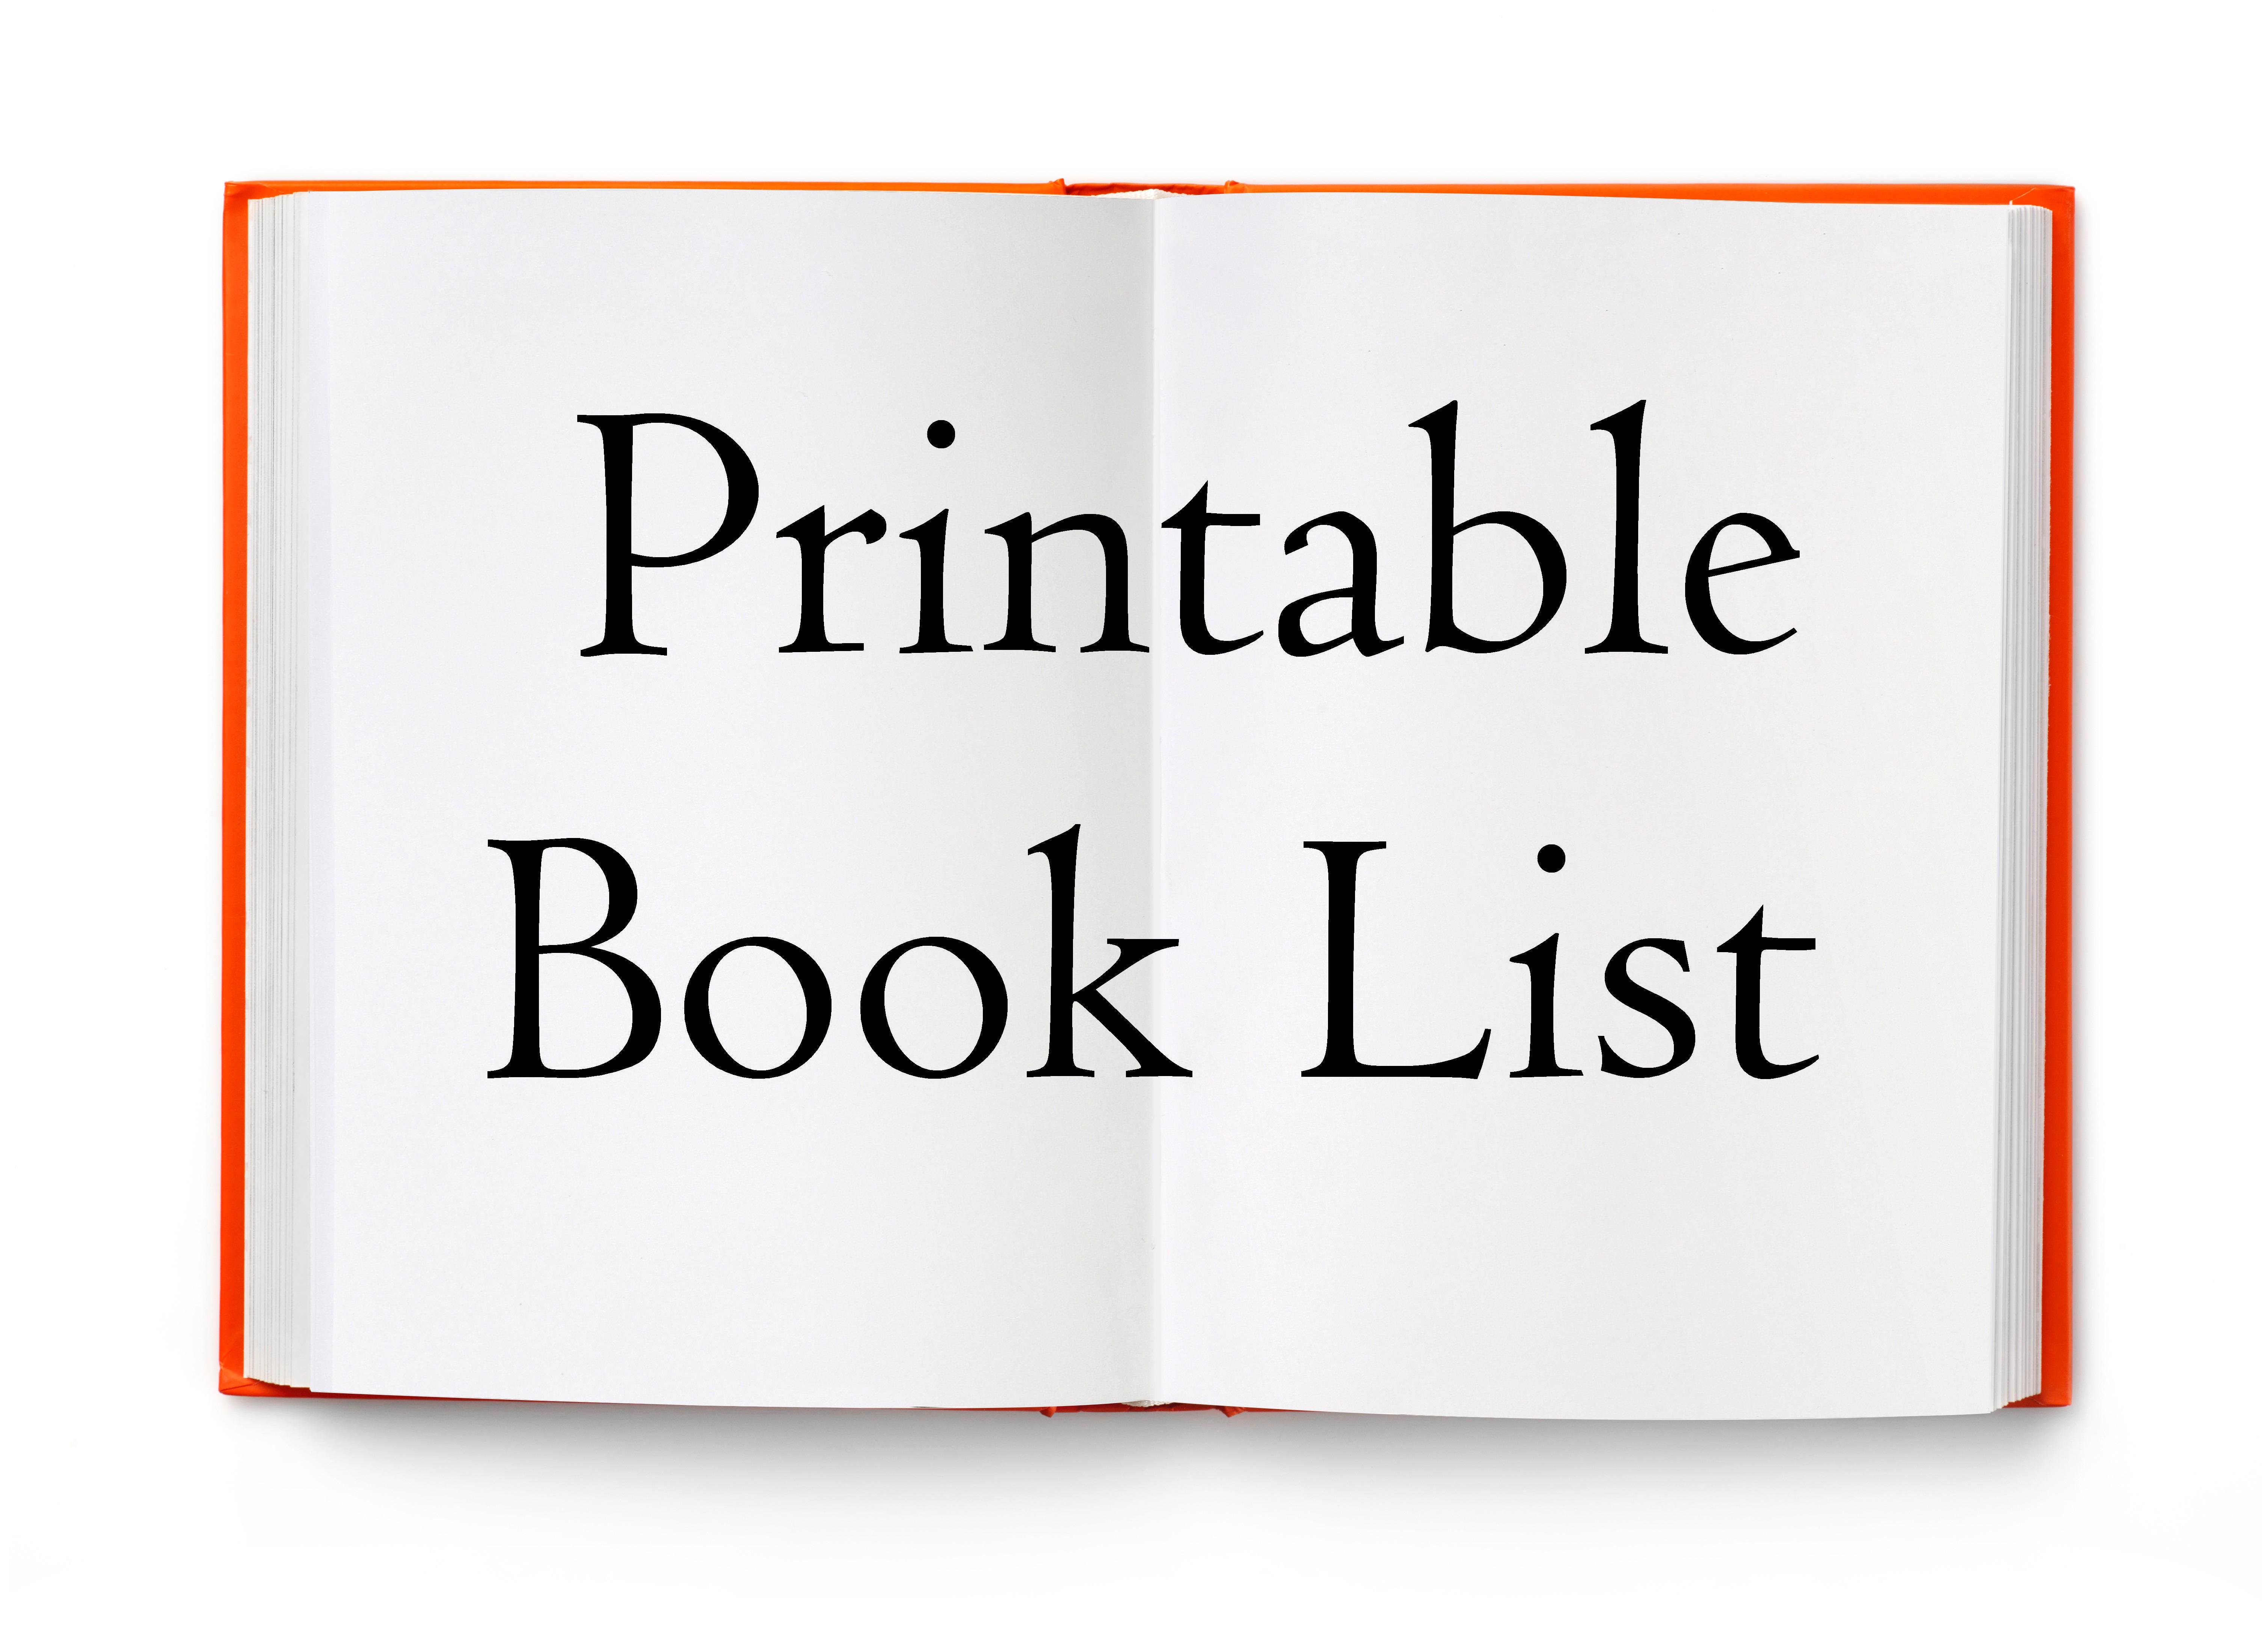 photograph regarding Who Was Book Series Printable List titled Printable Ebook Listing Writer Theresa Hissong